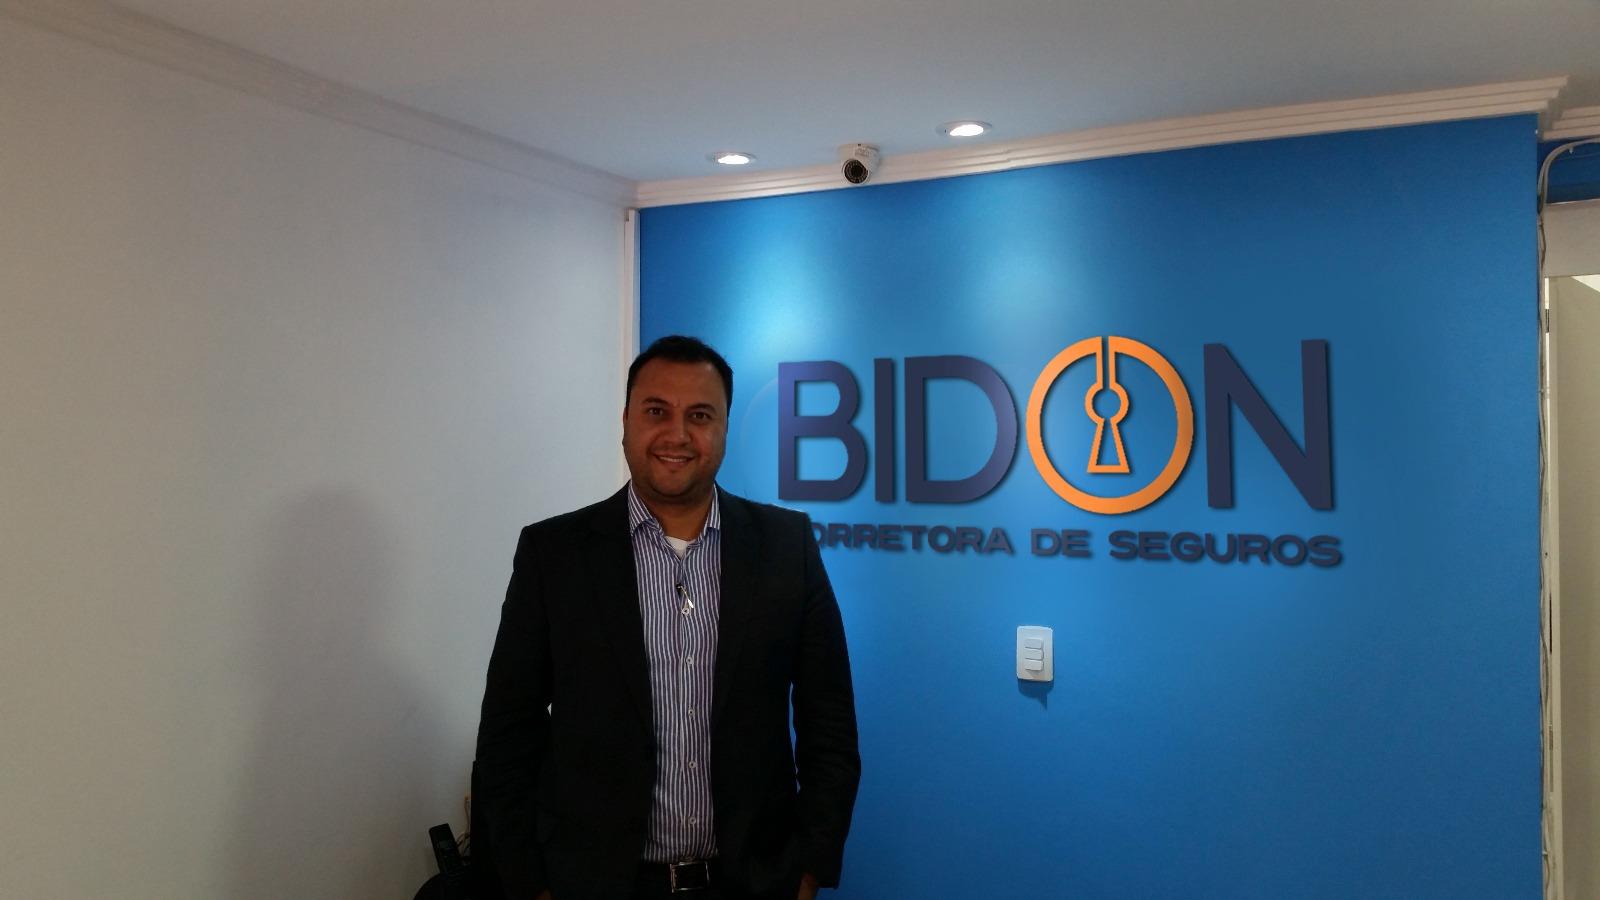 Bidon Corretora de Seguros mira novos empreendedores em feira